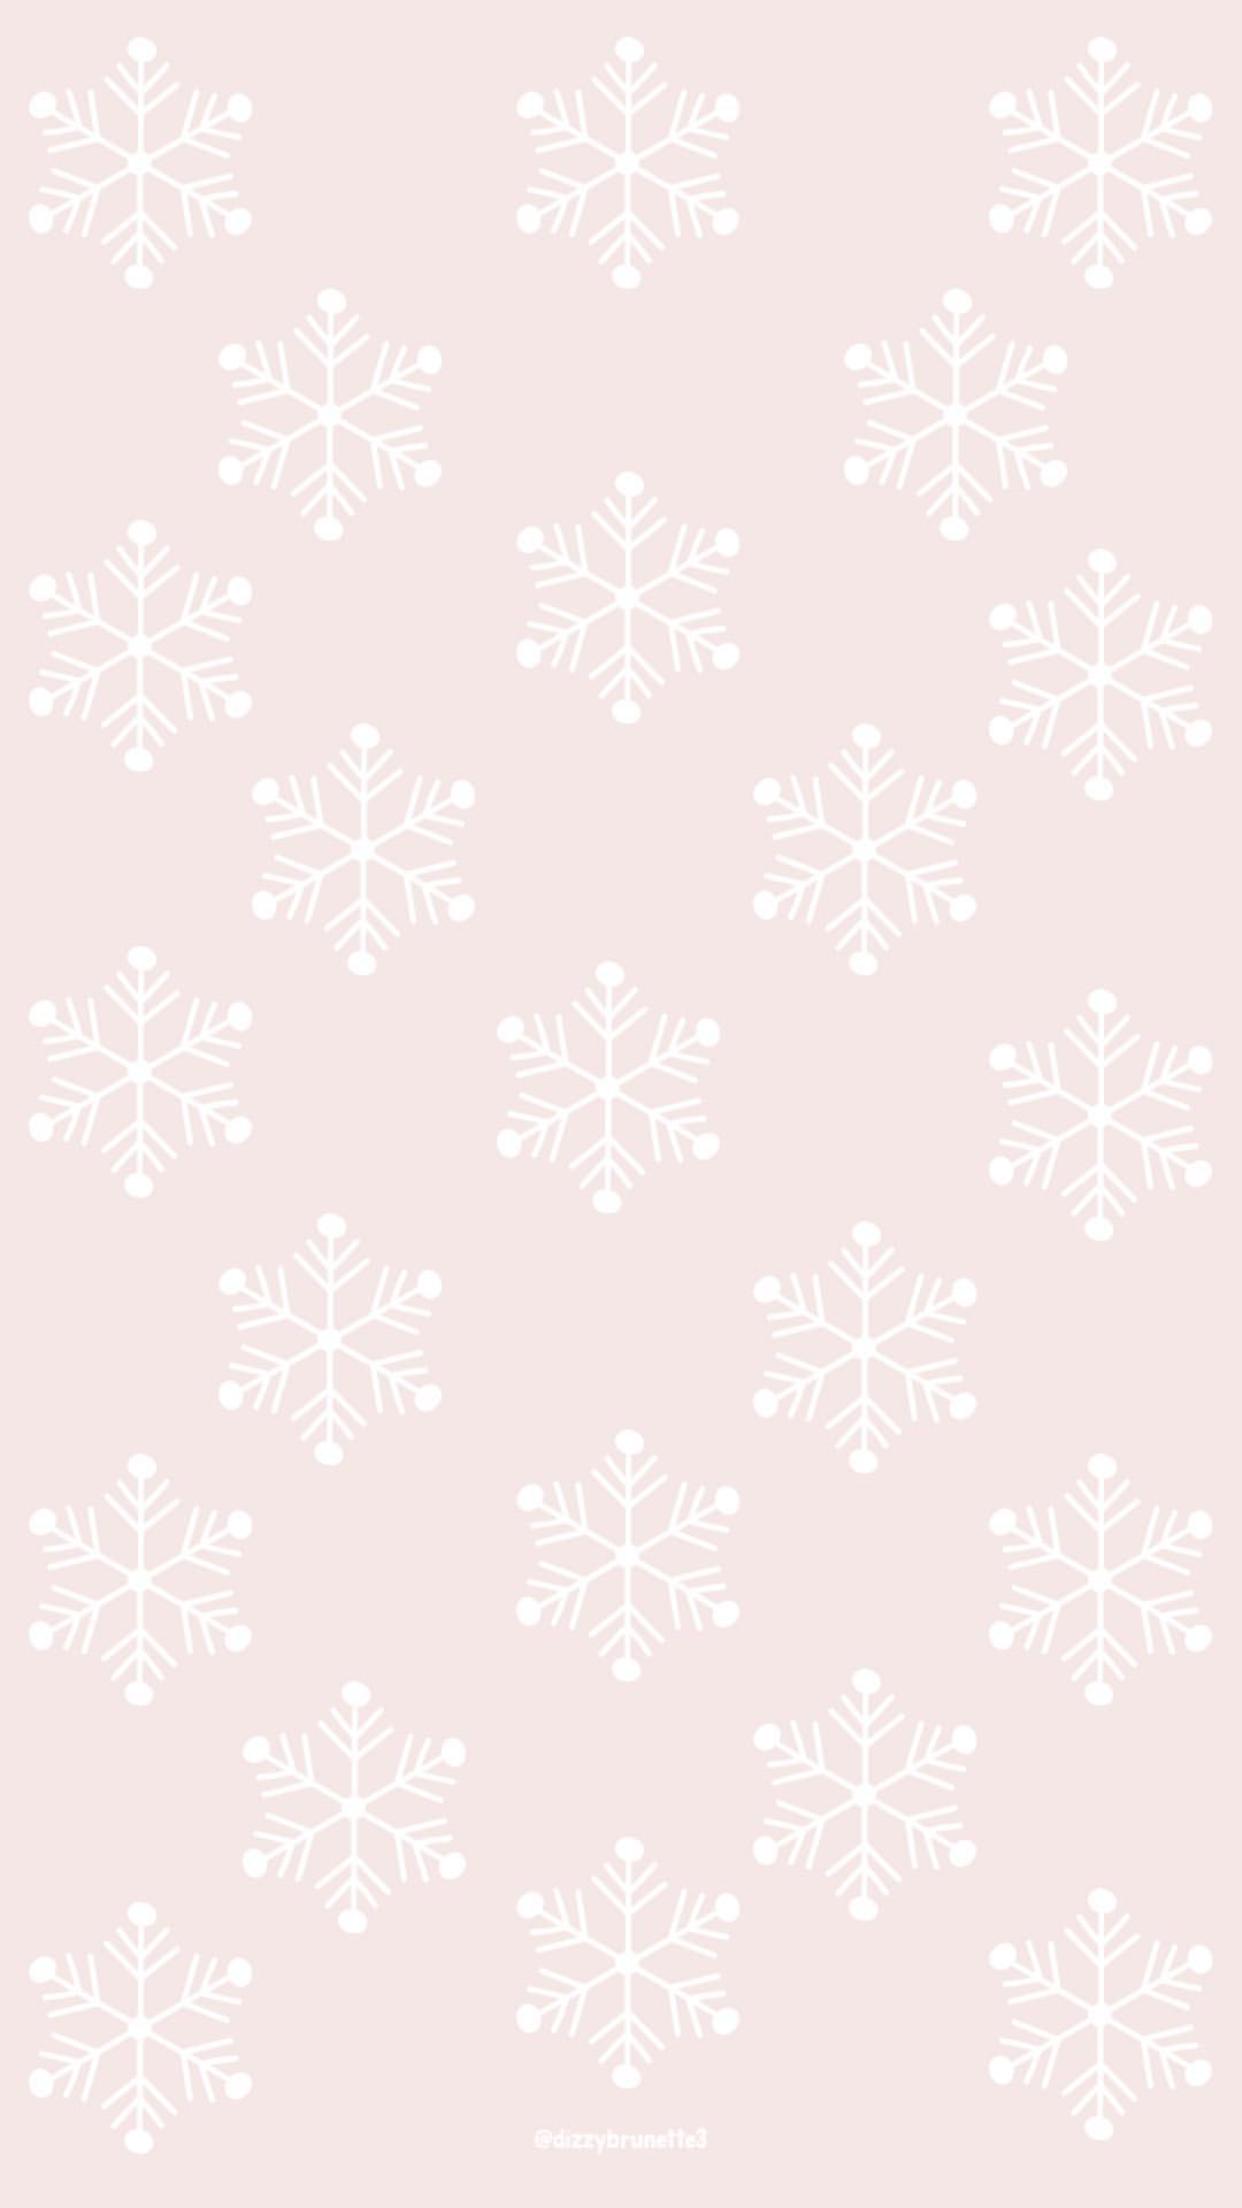 Pattern Snowflakes Winter Wallpaper Iphone Christmas Christmas Phone Wallpaper Cute Christmas Wallpaper